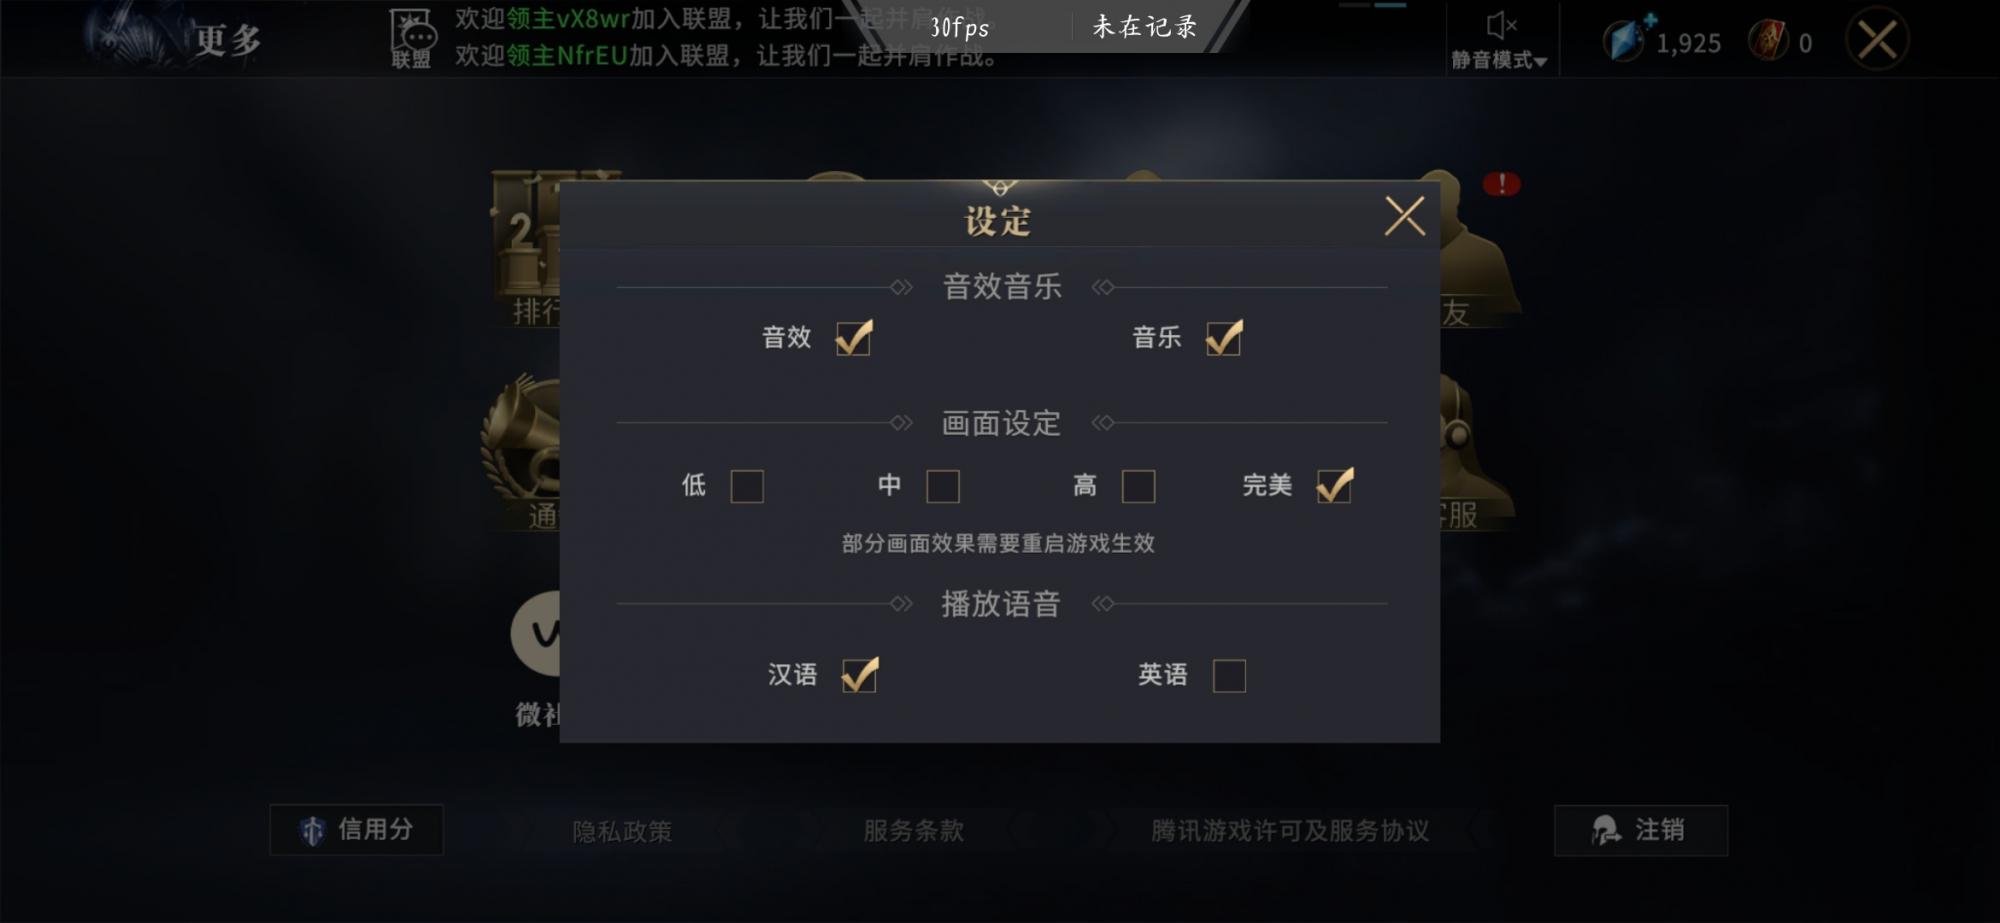 Screenshot_20190717_195202_com.tencent.yoozoo.got.jpg